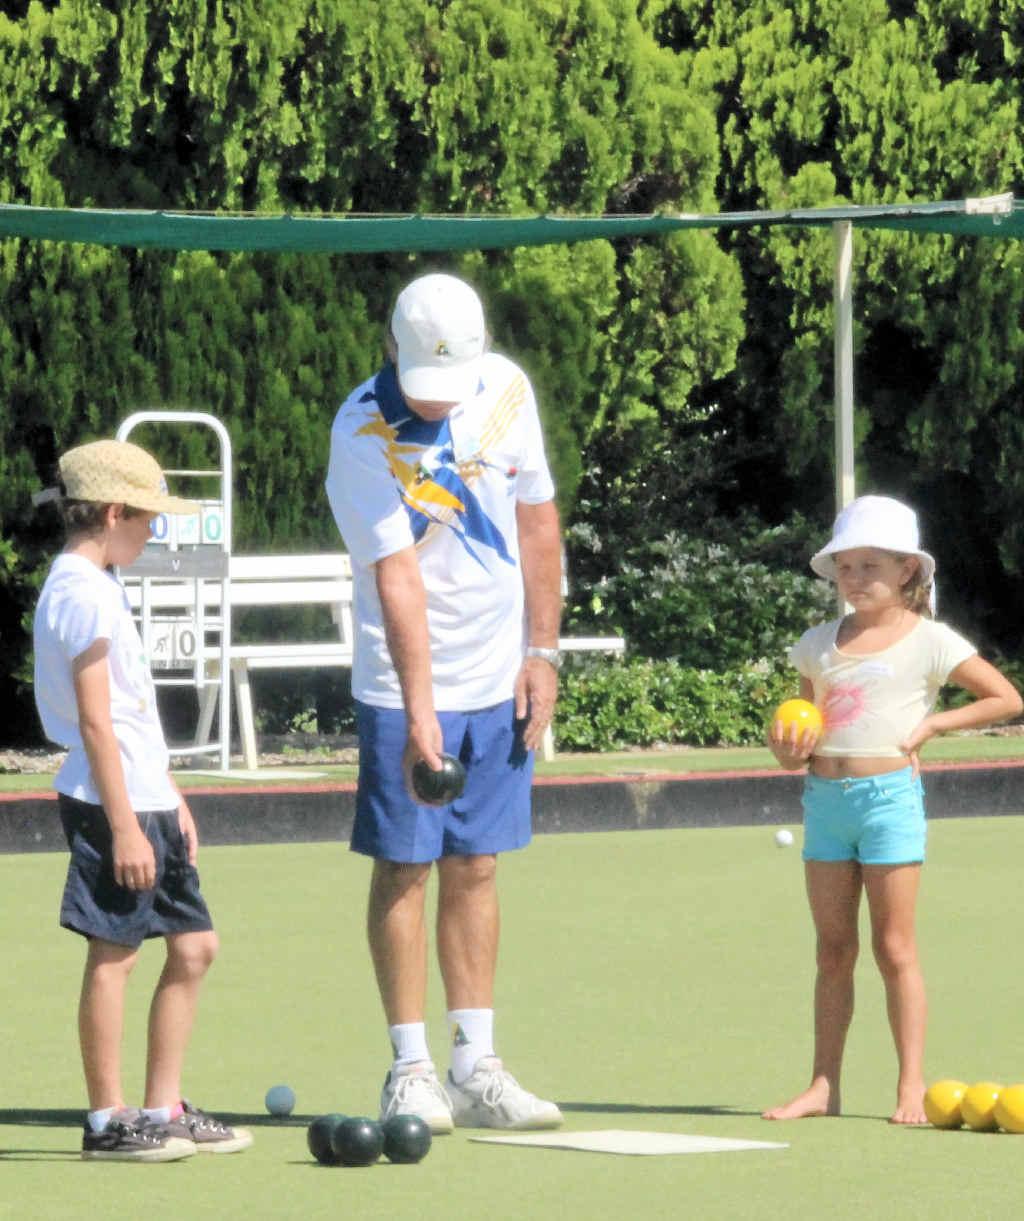 BOWLS FUN: Club coach Pete Stephan teaches young bowlers Simon Dwyer and Georgina Drysdale some new tricks.